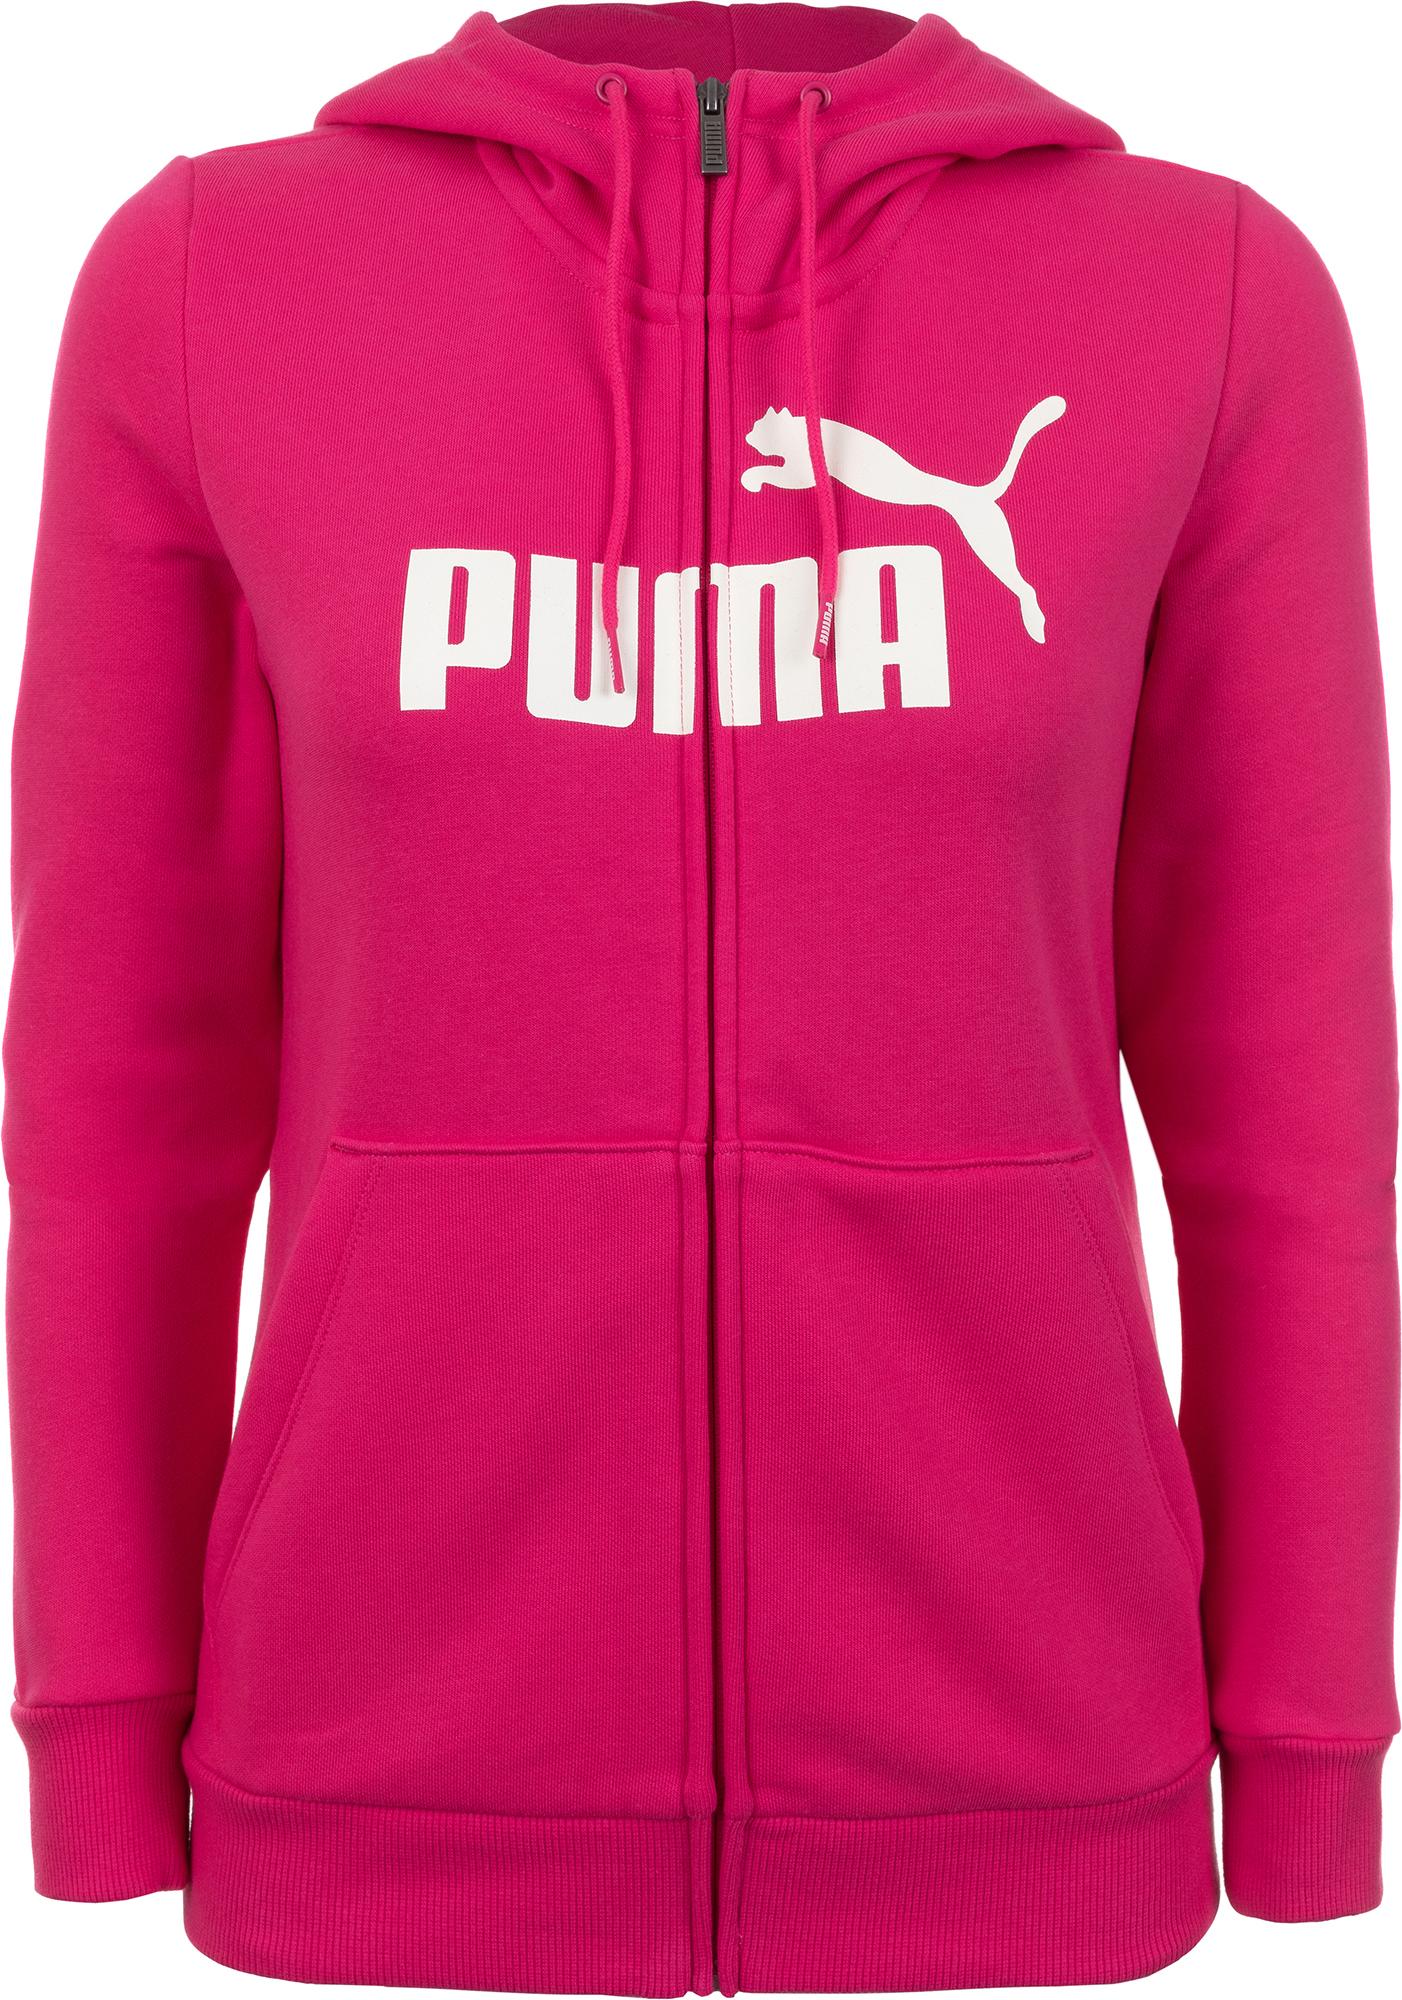 Puma Джемпер женский Puma Ess Logo Hooded, размер 48-50